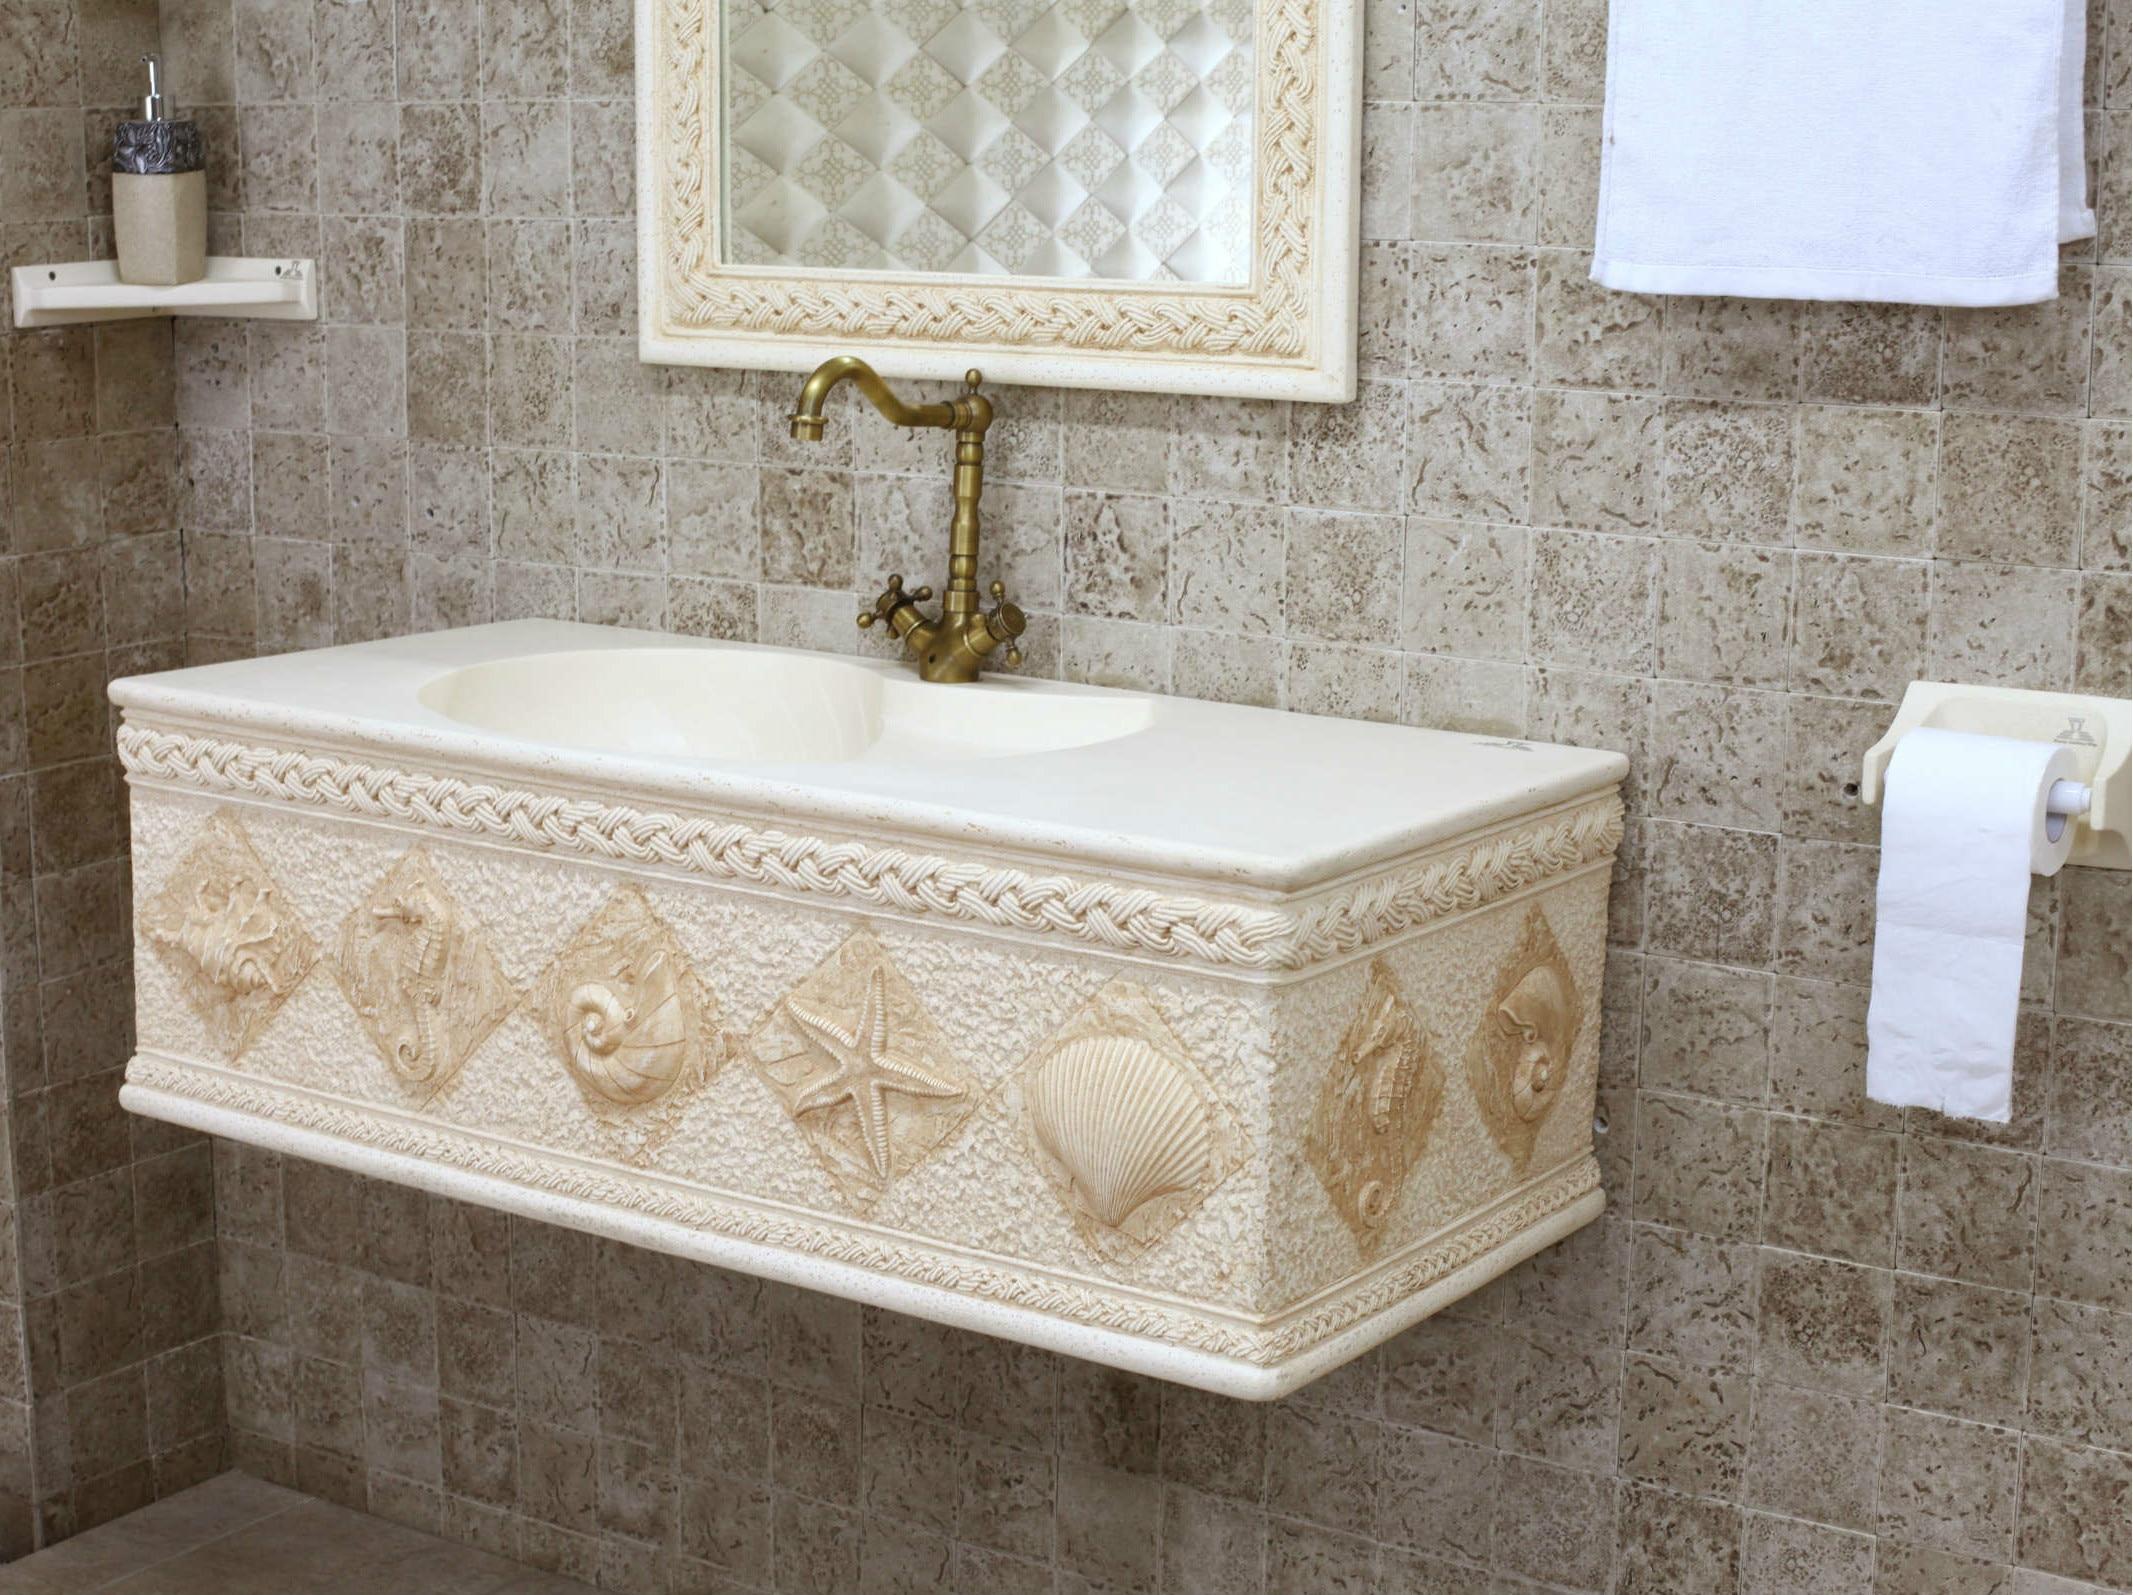 Wash Basin Bathroom : ... meaka carved wash basin bathroom wash basin wash pool bathroom cabinet